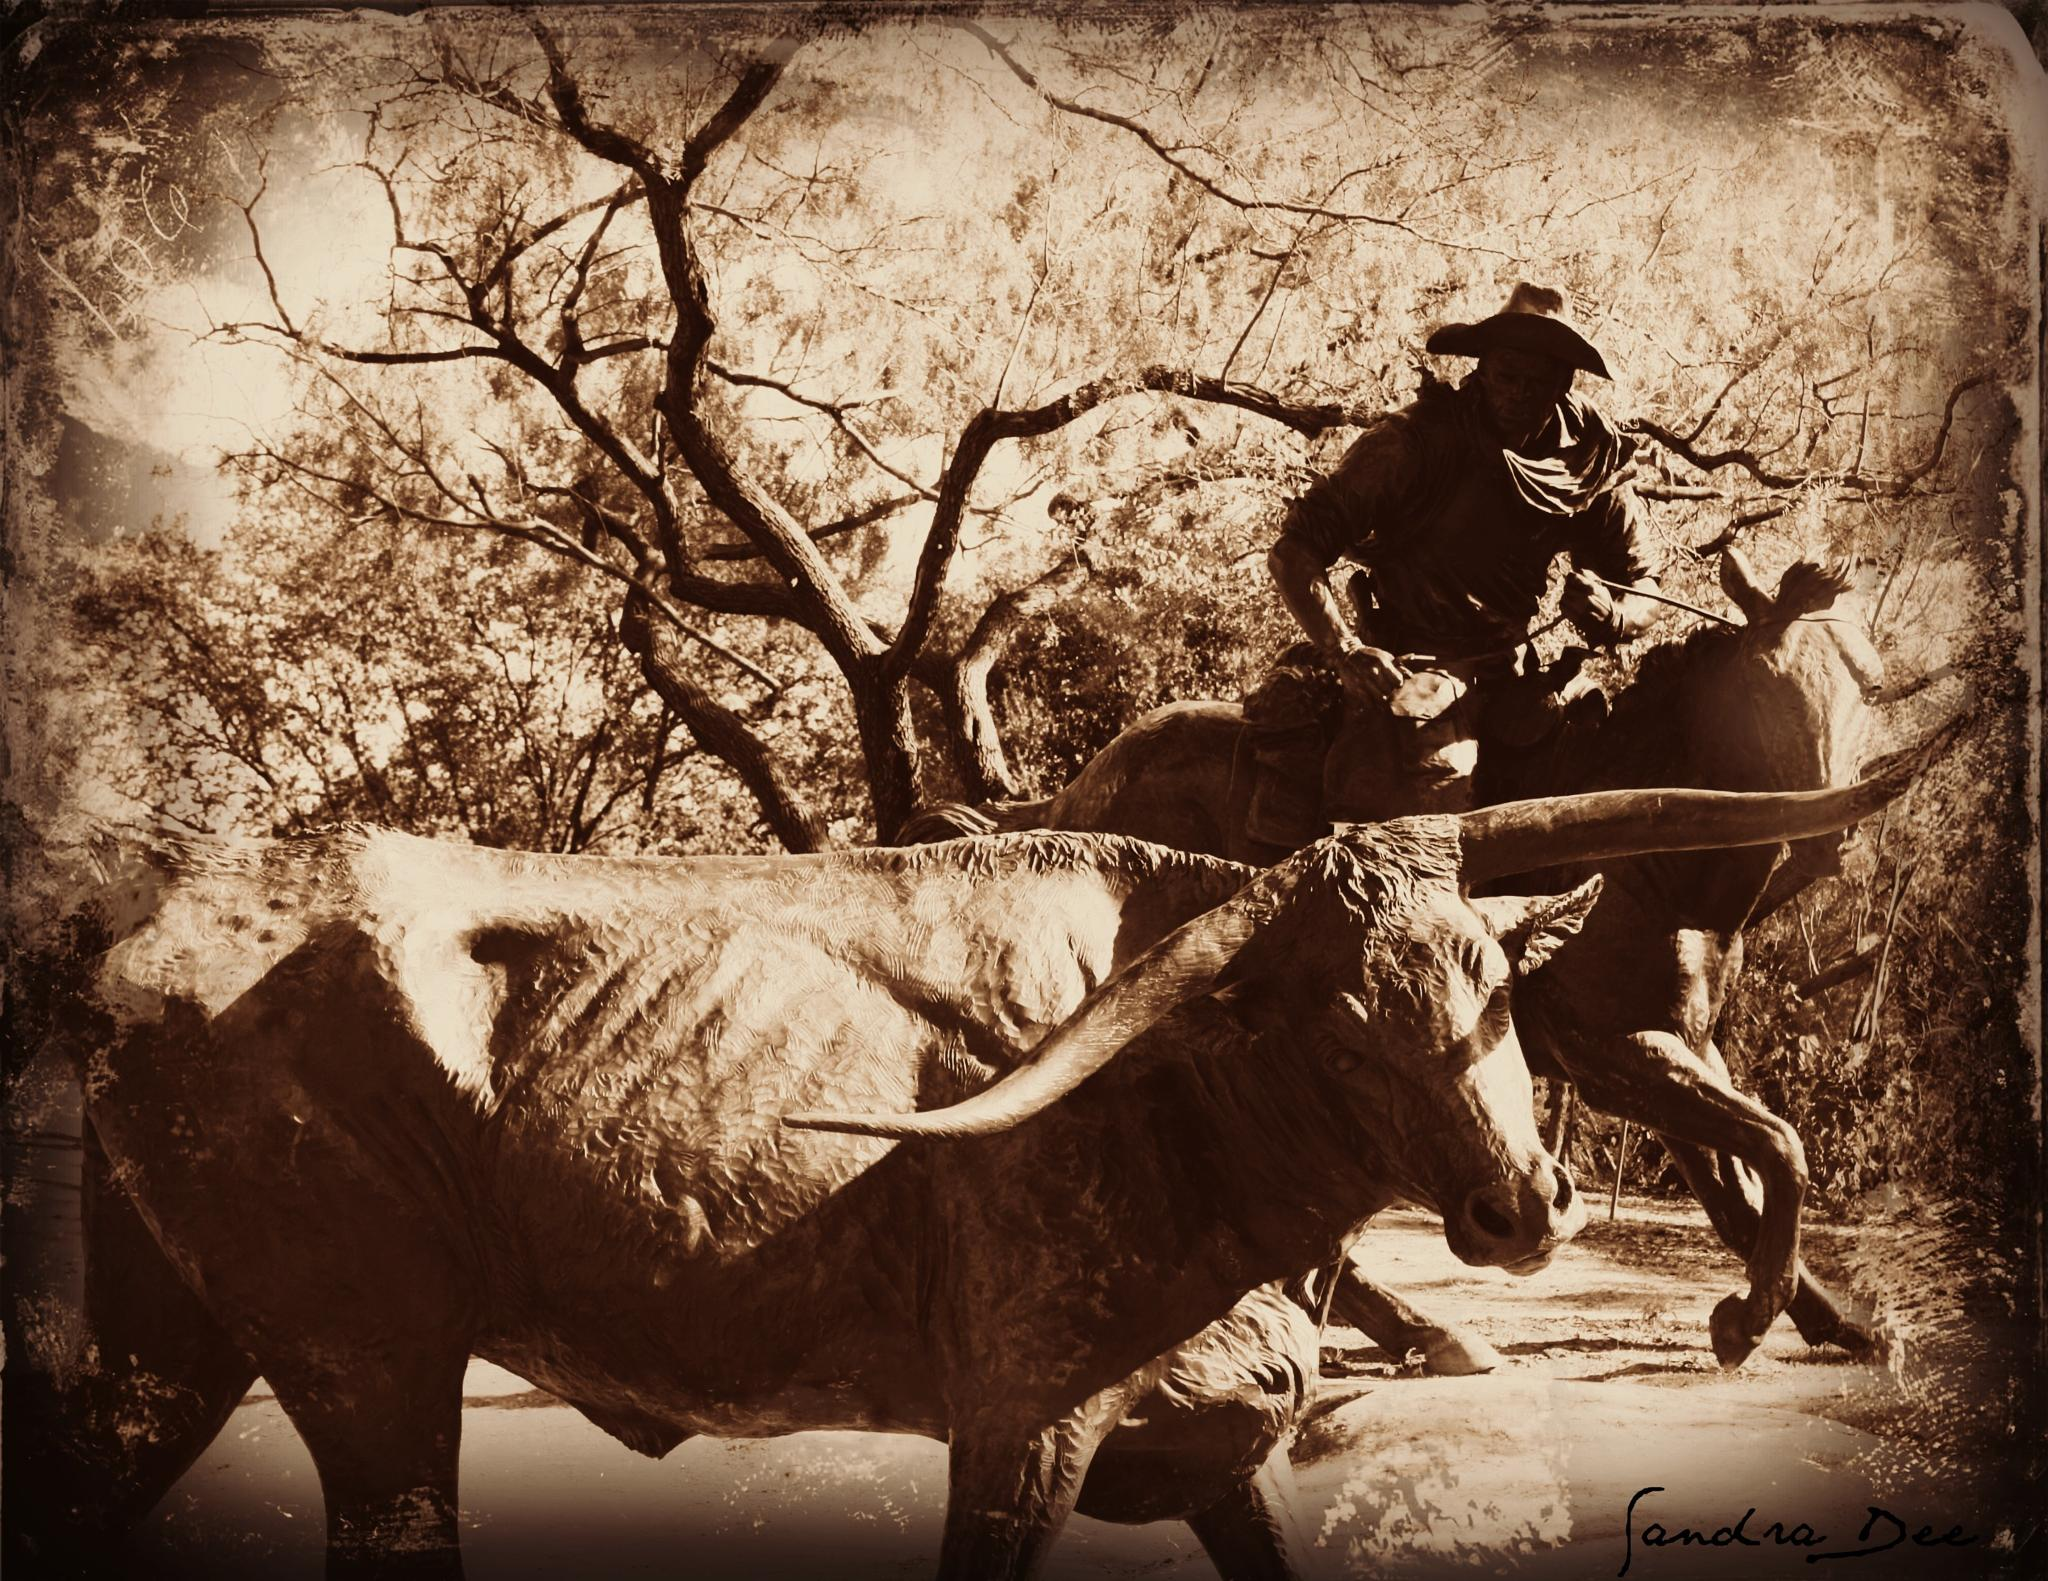 Pioneer Plaza Cattle Drive 2 by sandra.sherman.7334